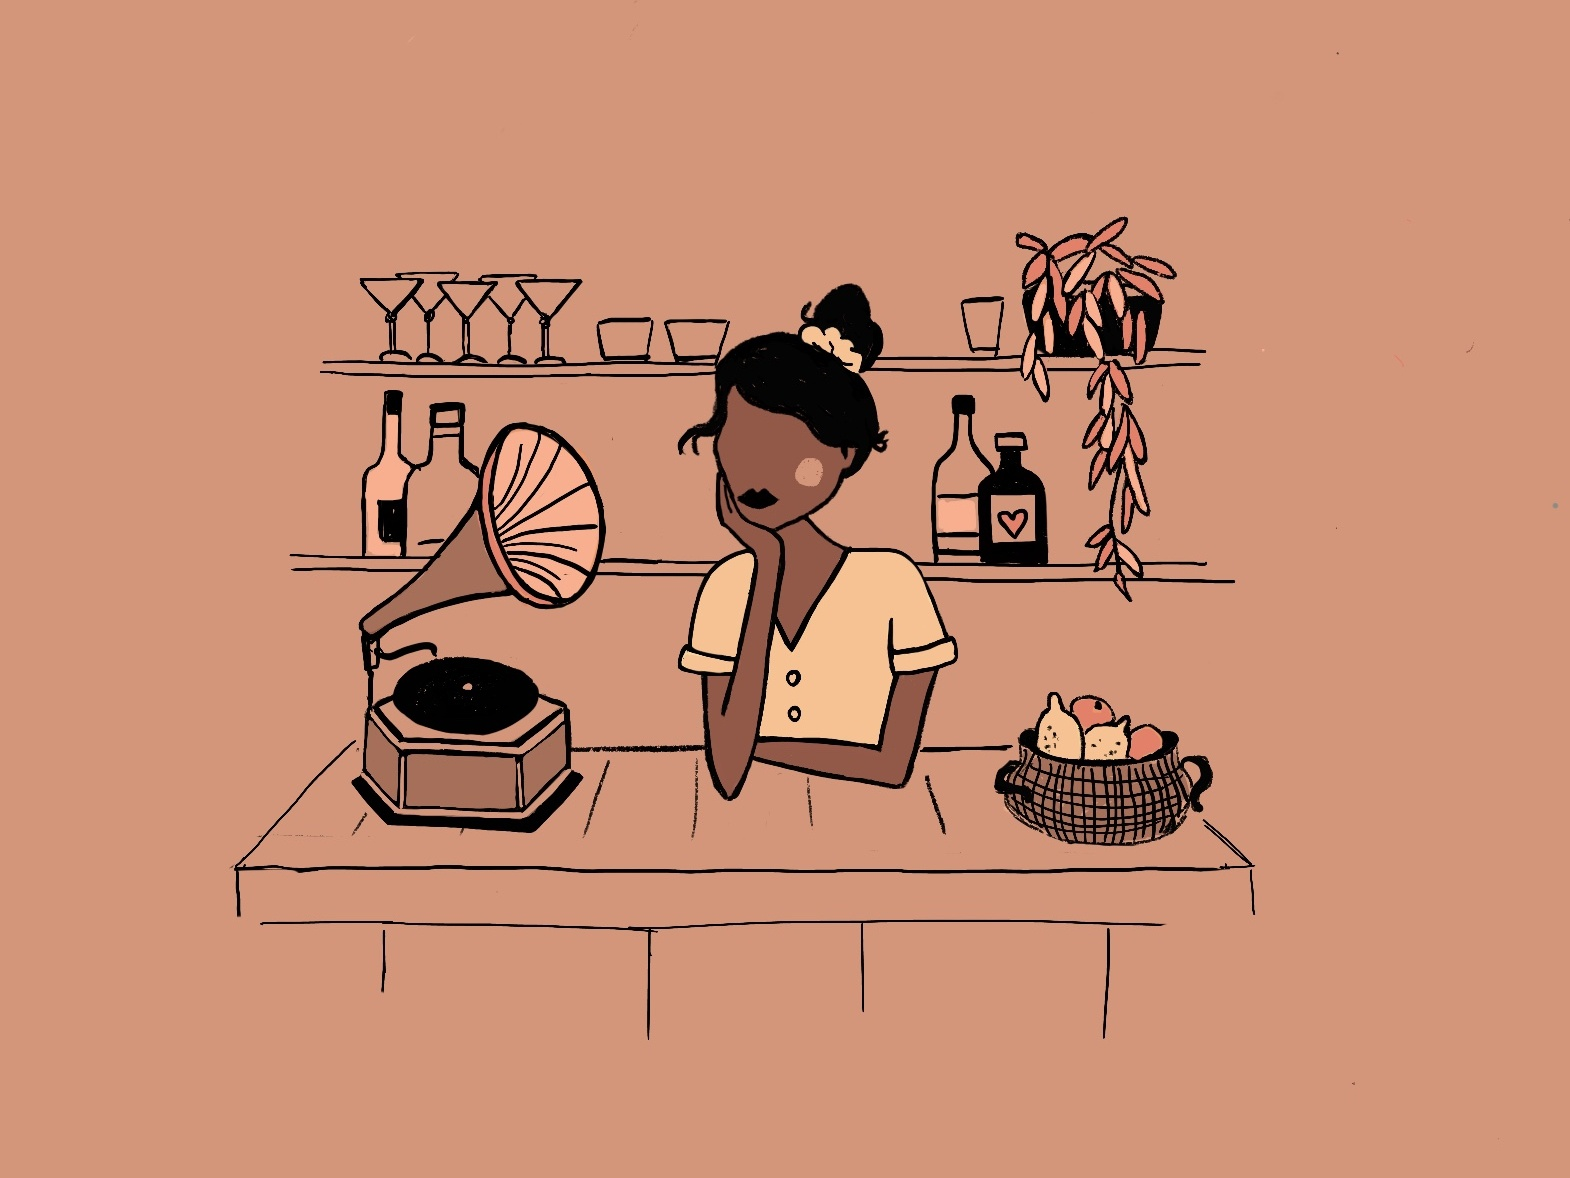 A shot of Fado katrin kohl kati kohl procreate illustration art illustrator saudade cocktail bar grammophon girl portugal lisbon illustration